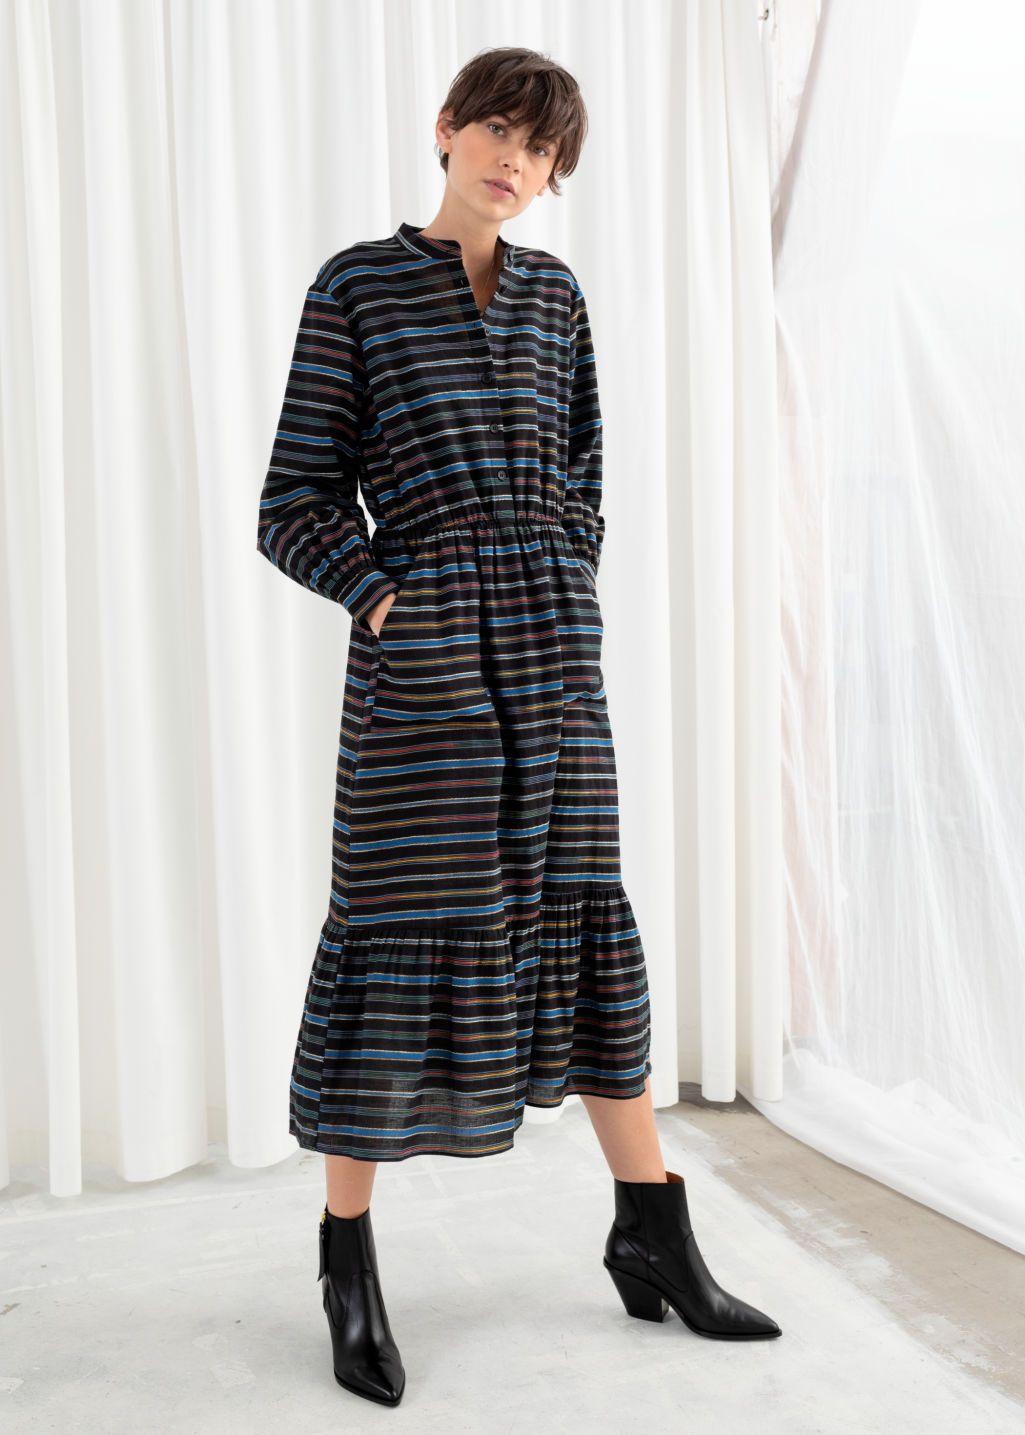 37+ Striped midi dress ideas in 2021